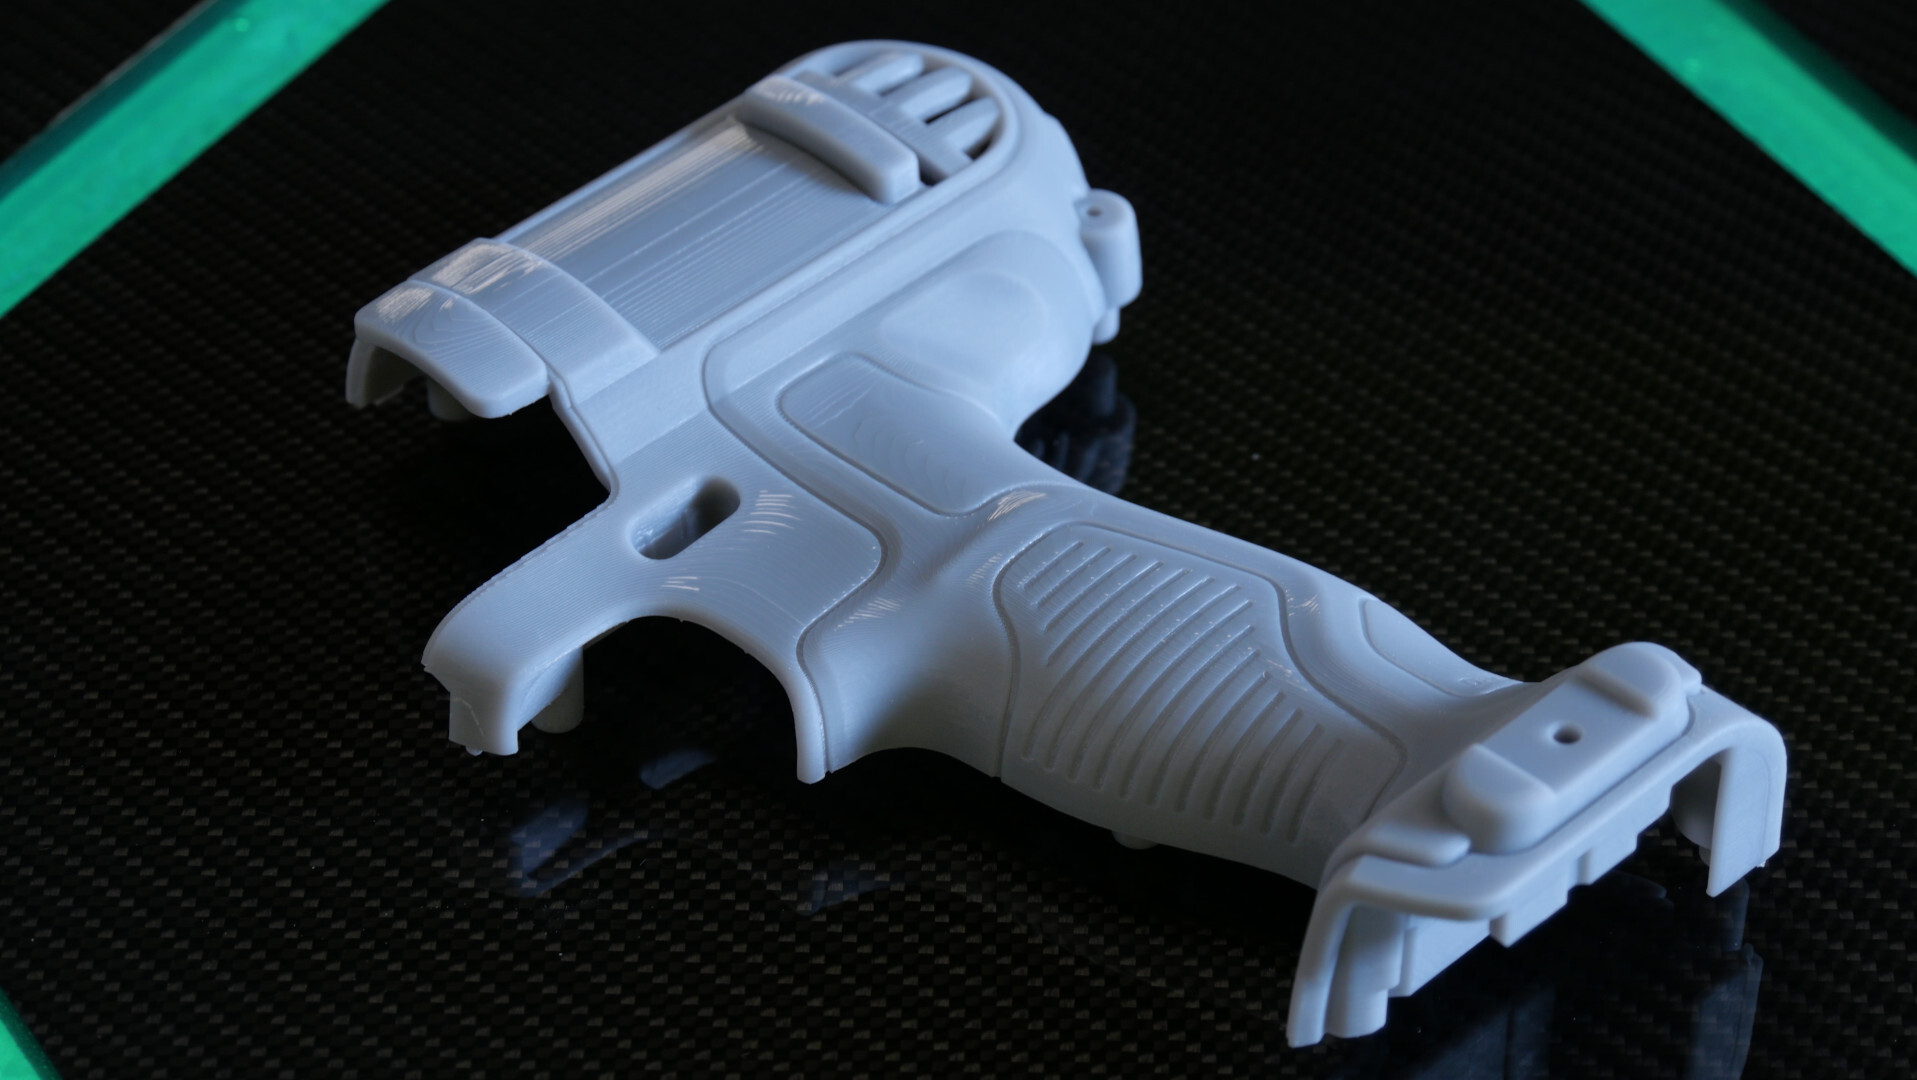 Power tool enclosure SLA print